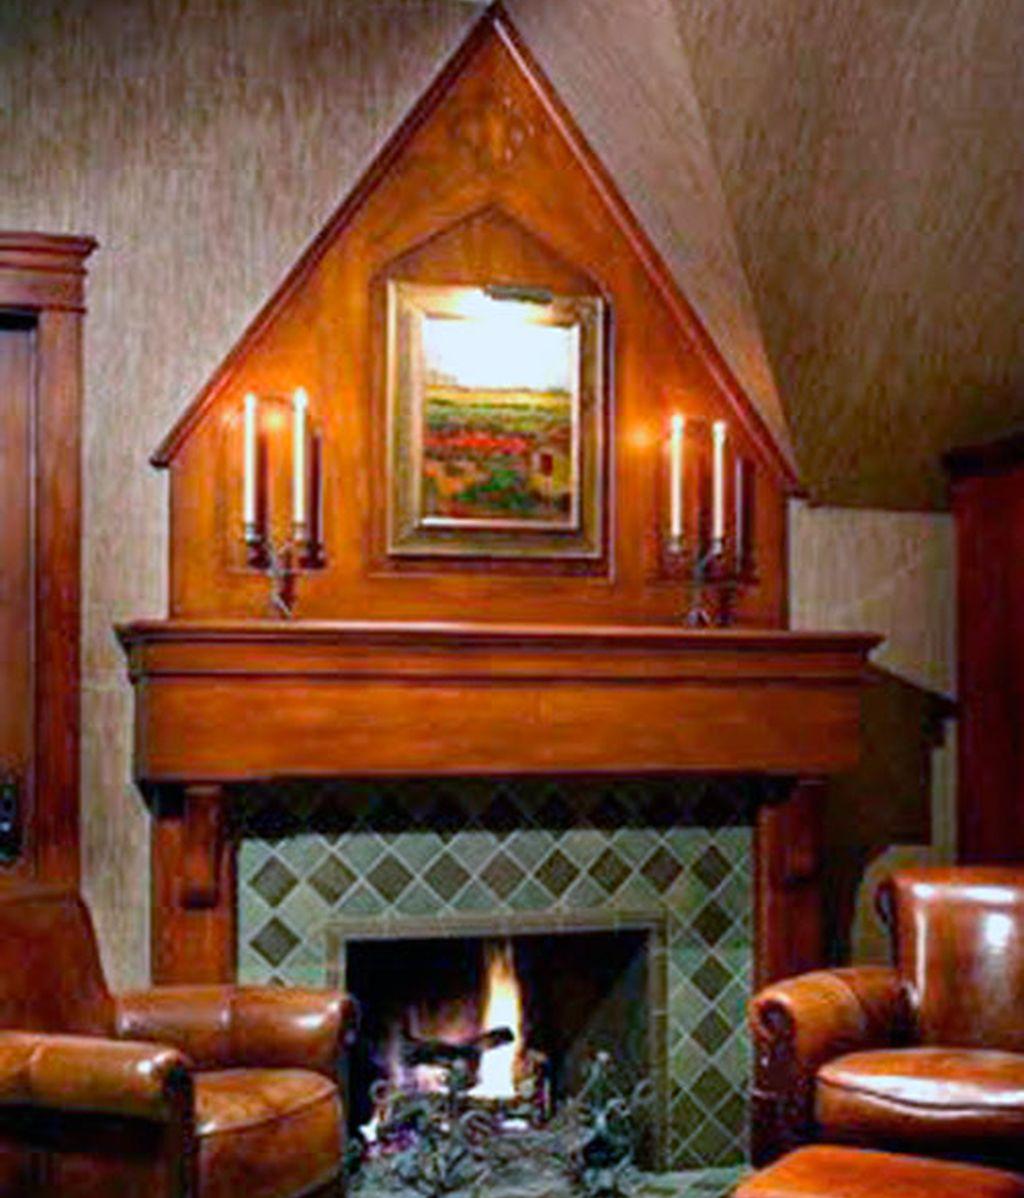 Prepara la chequera: Andie MacDowell vende su casa